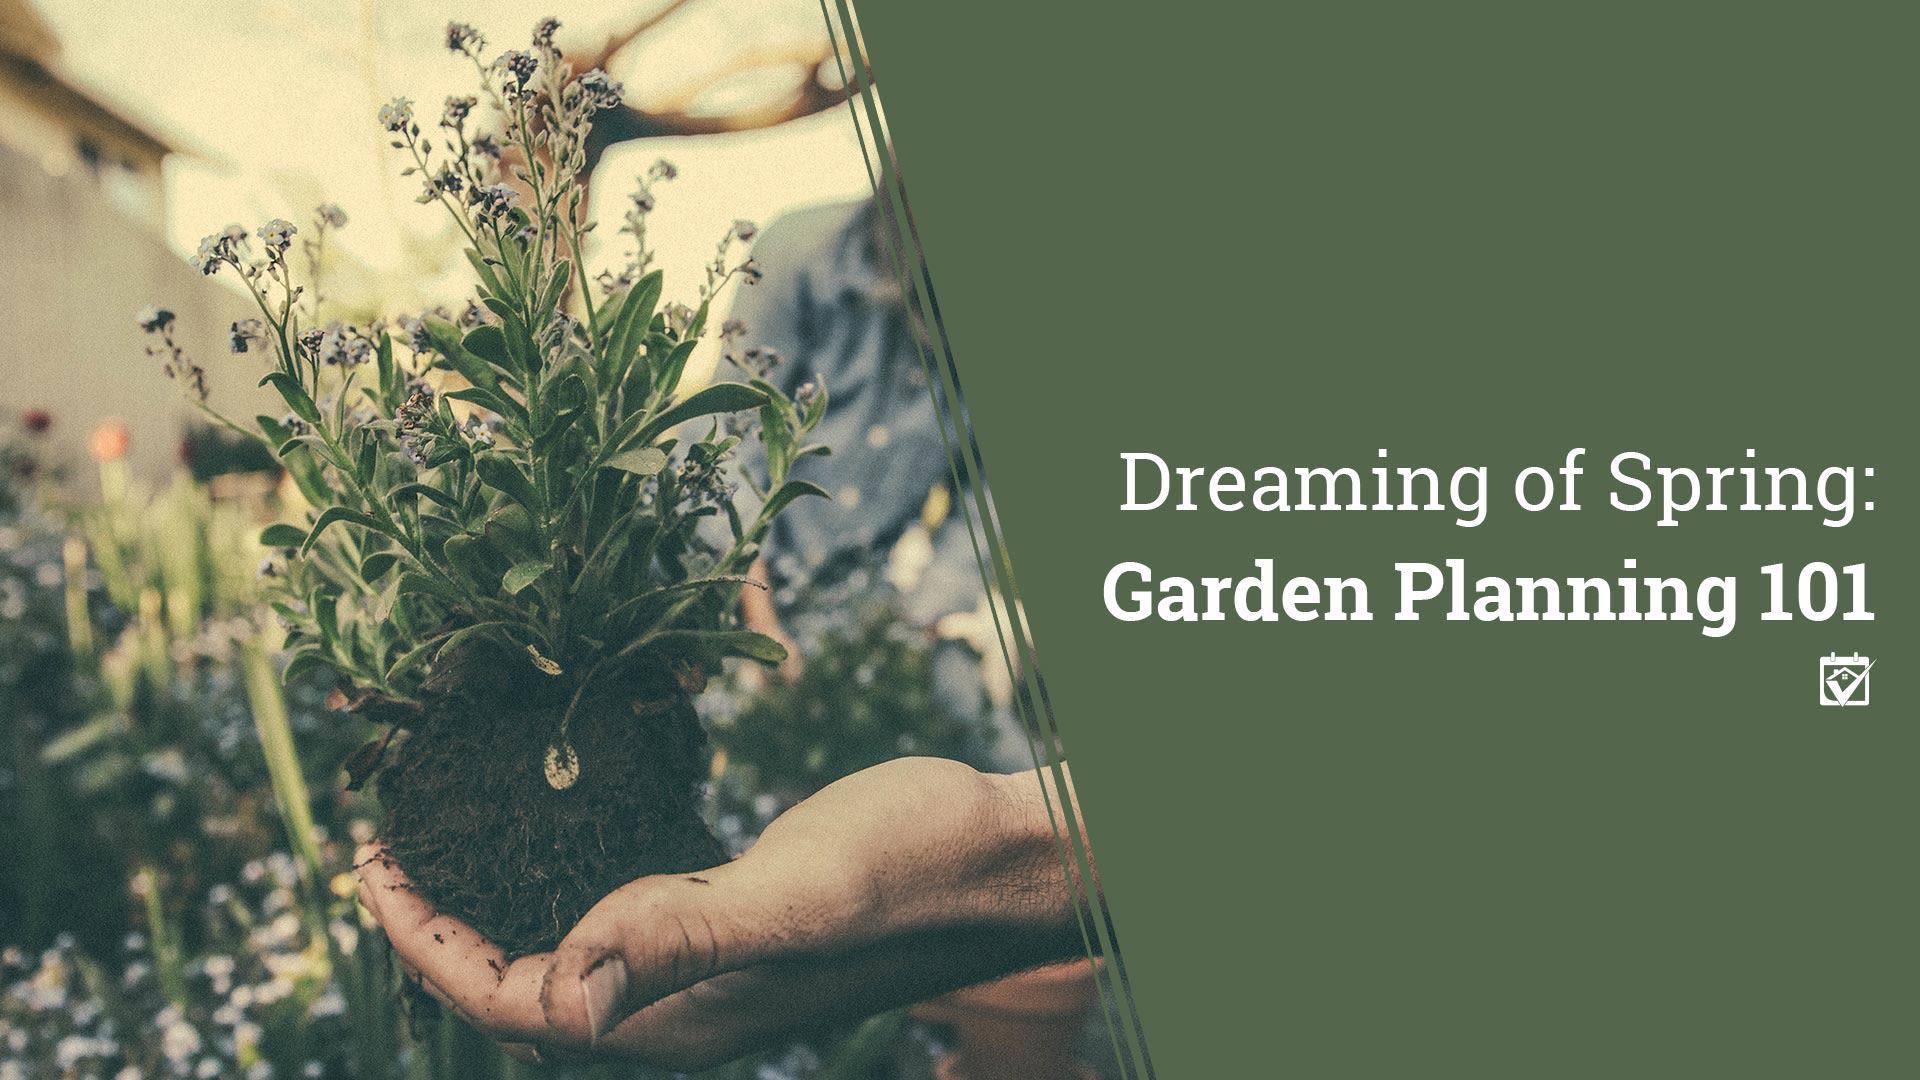 Dreaming of your Spring Garden?